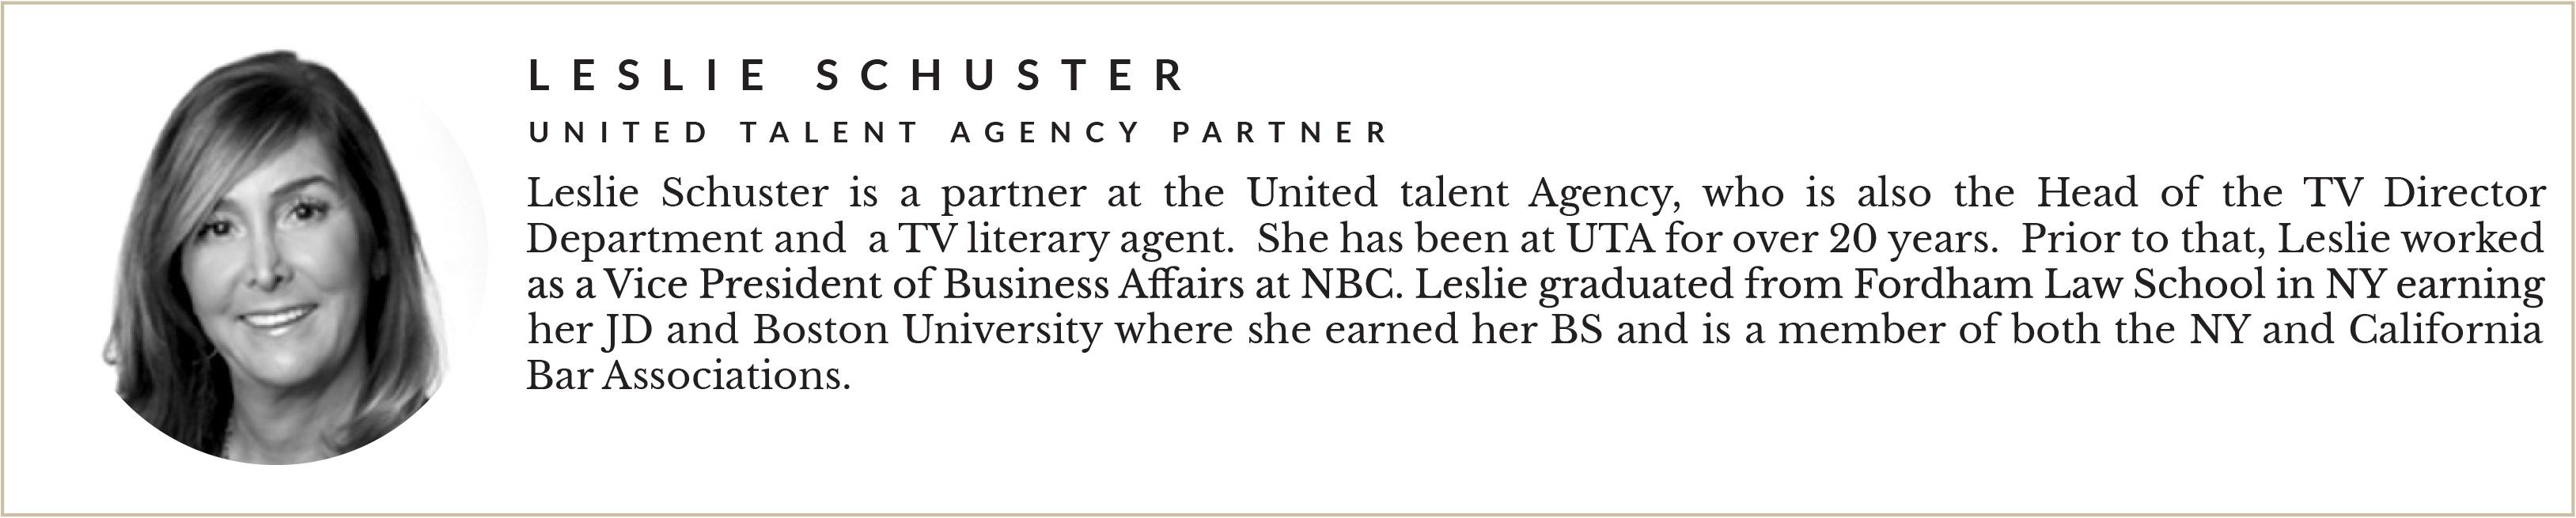 Entity presents Leslie Schuster